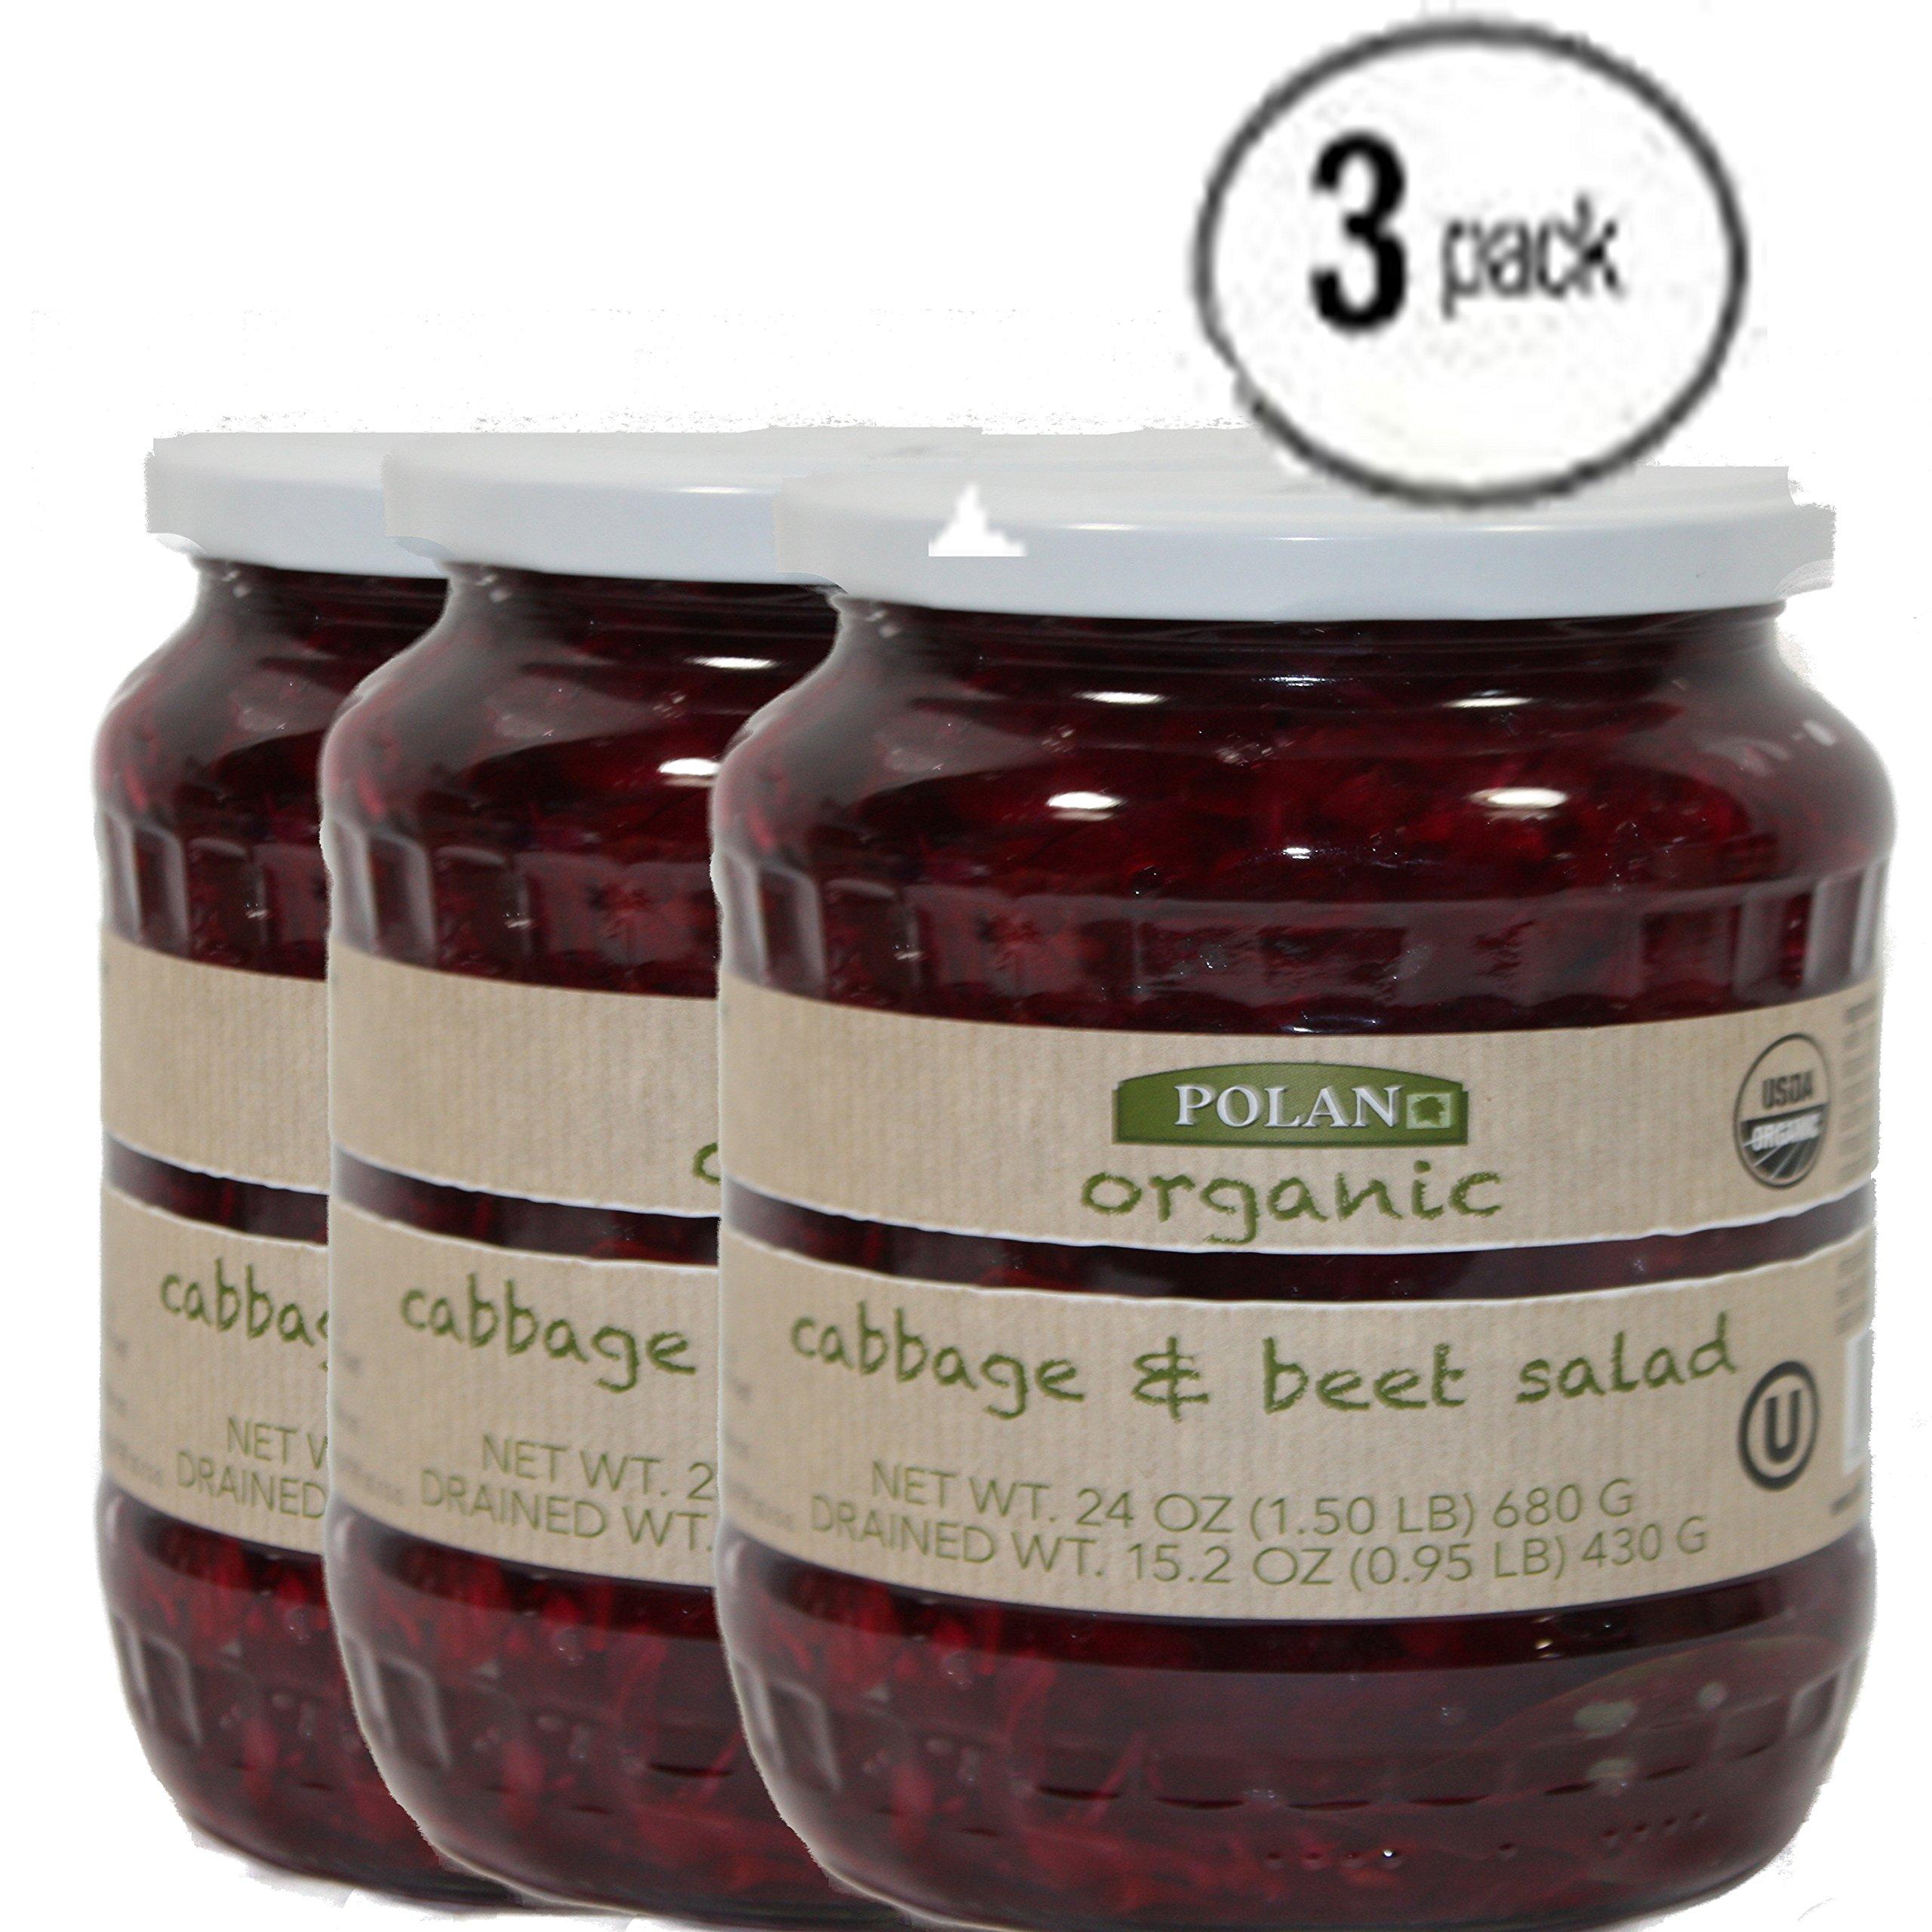 Poland Organic Cabbage & Beets Salad BUNDLE 3 Jars 24oz. EACH